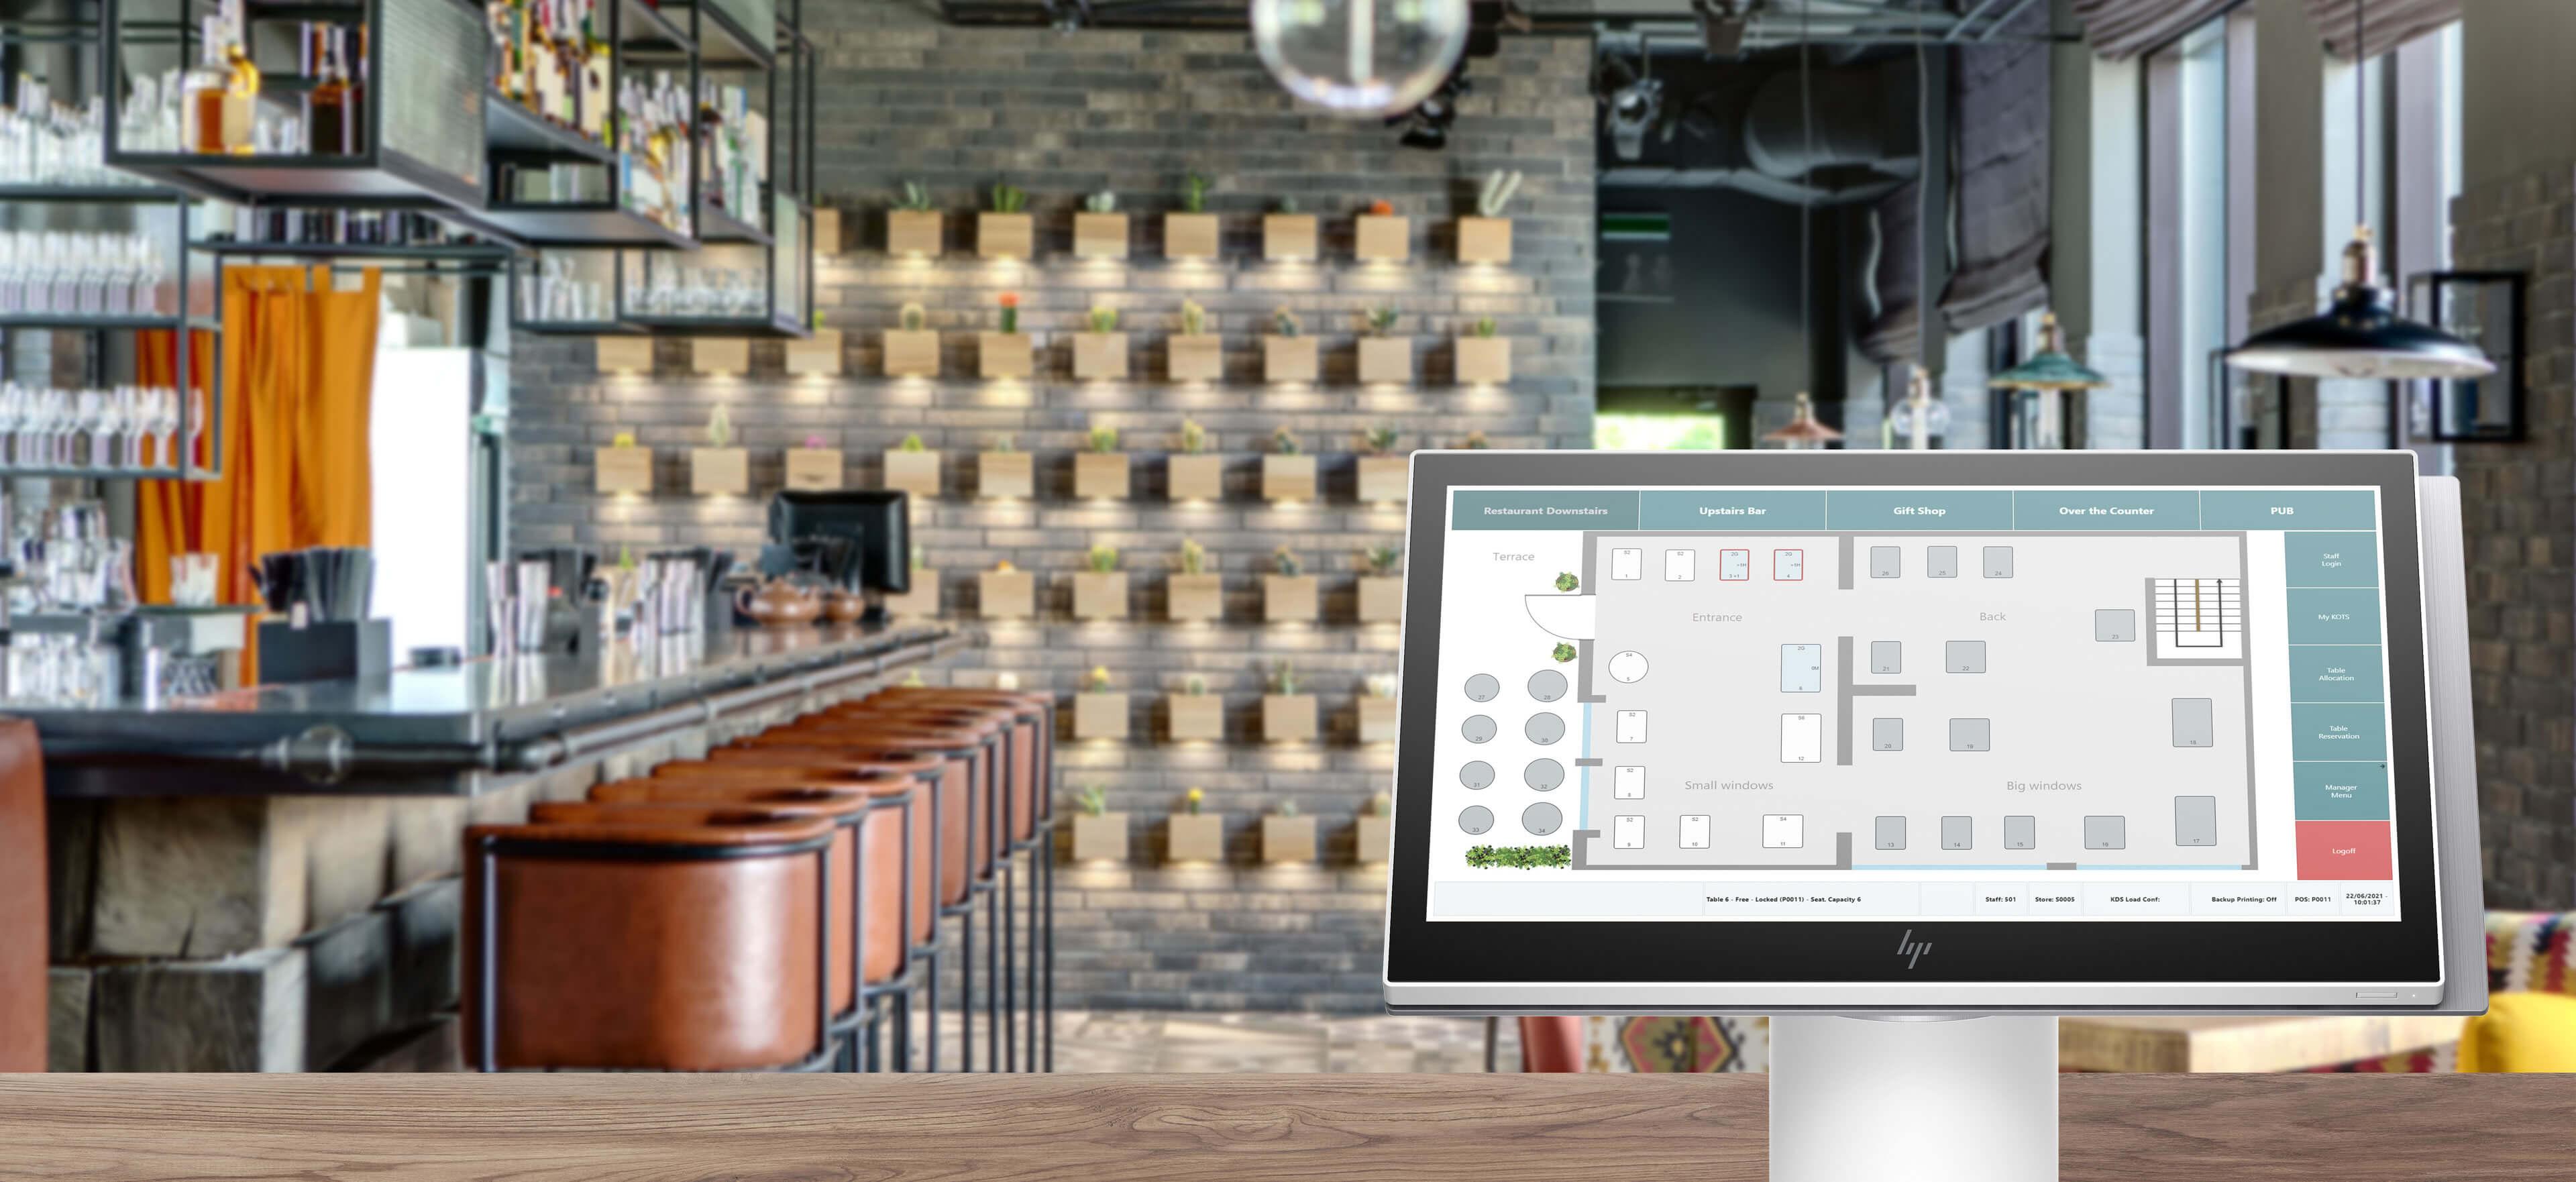 LS-Central-for-restaurants-Restaurant-Point-of-Sale-header